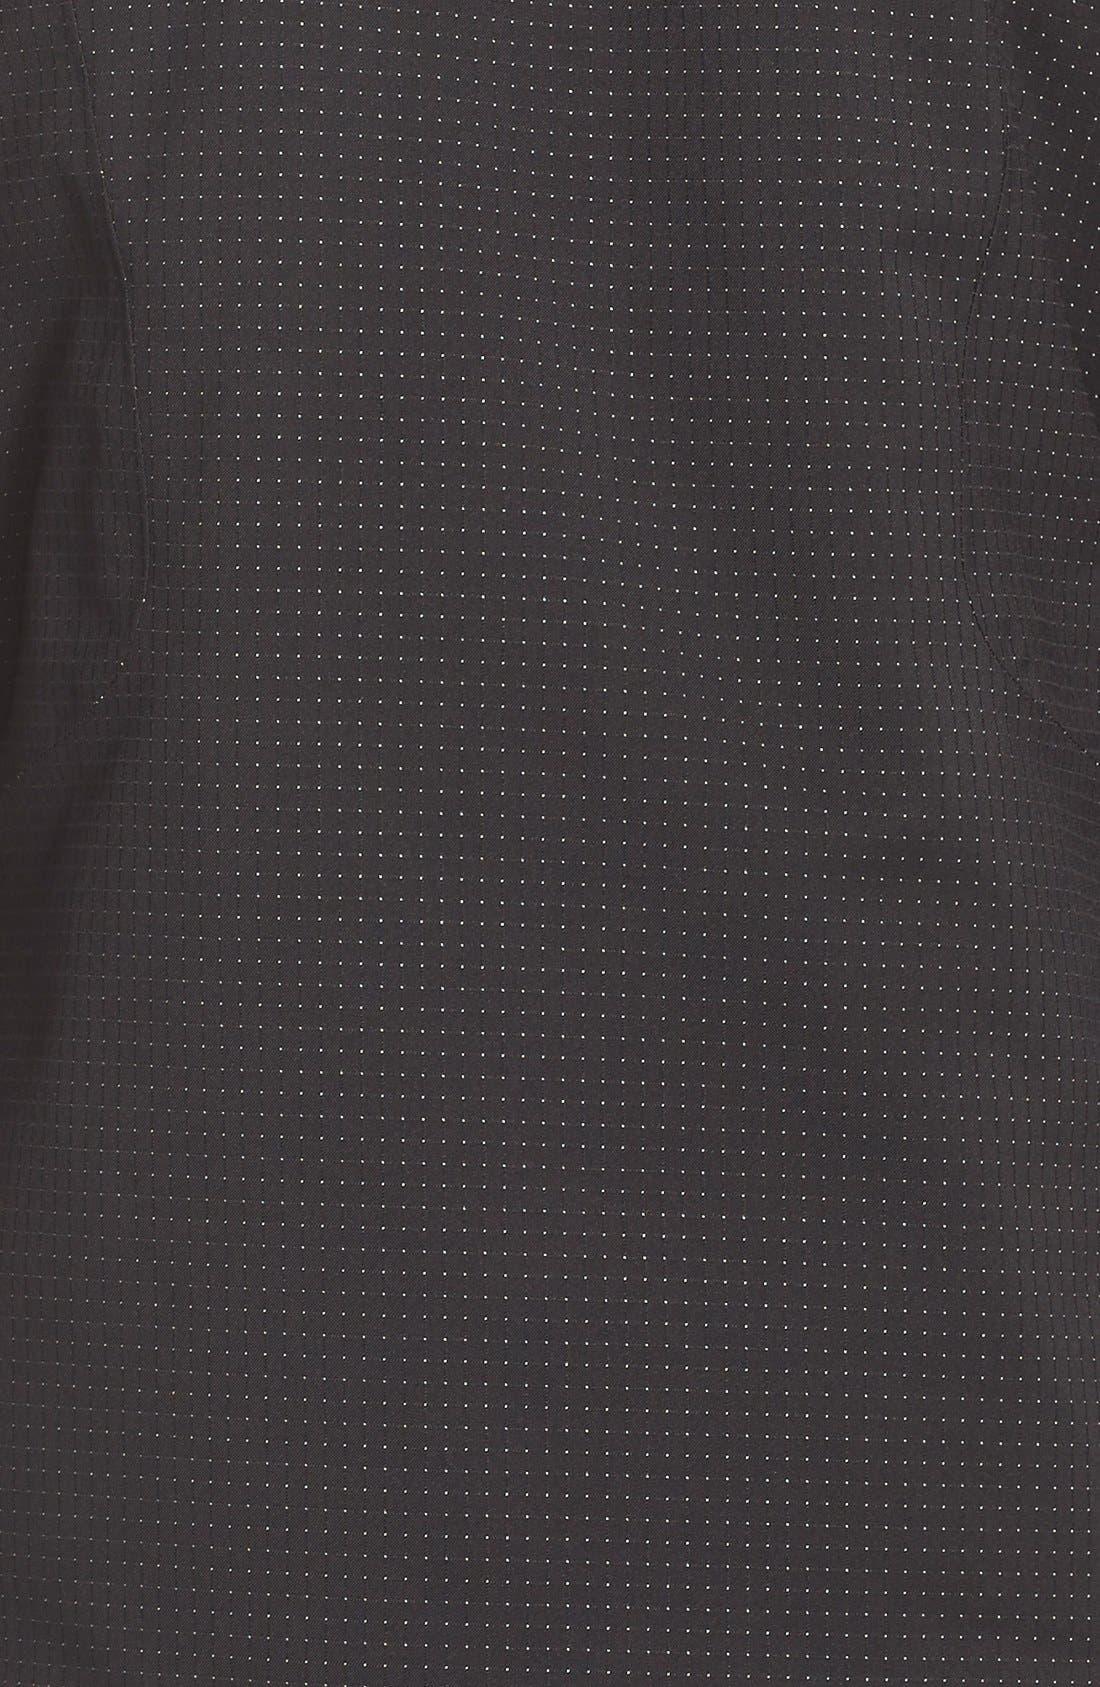 THE NORTH FACE,                             'Lulea' Waterpoof Heatseeker<sup>™</sup> Jacket,                             Alternate thumbnail 4, color,                             001